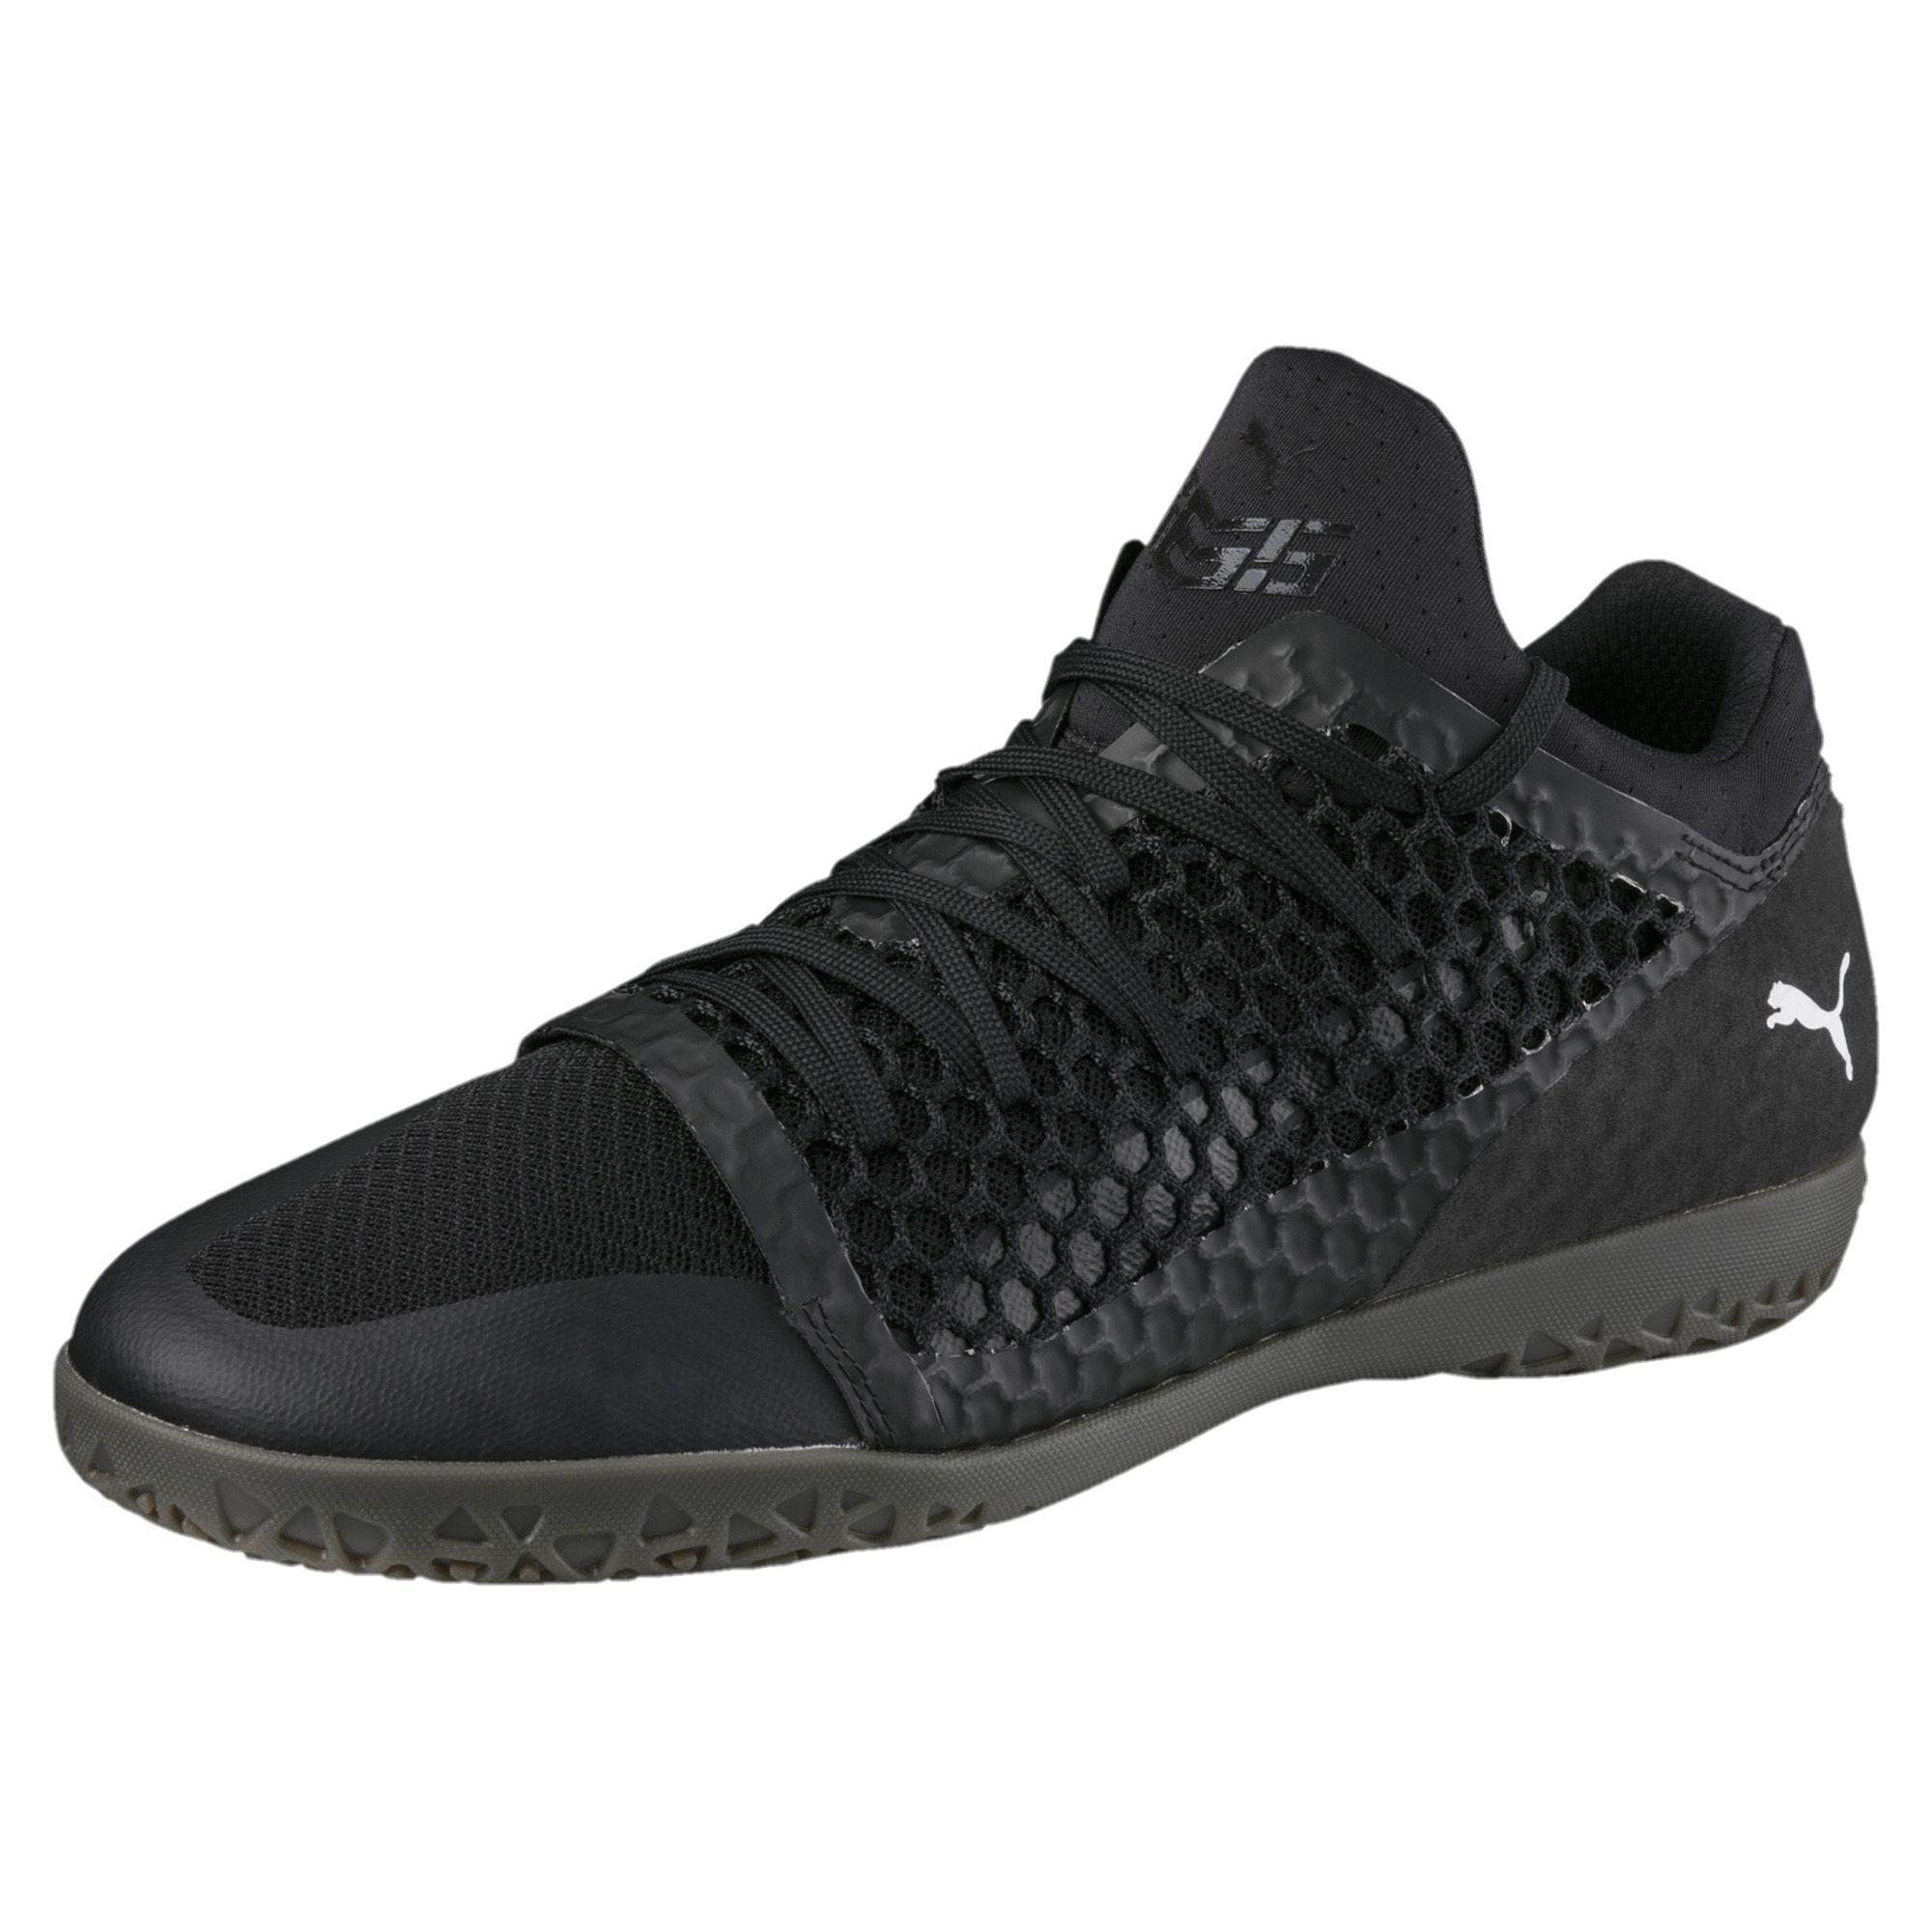 81cfd7edfeb8 Lyst - PUMA 365 Netfit Ct Men s Soccer Shoes in Black for Men